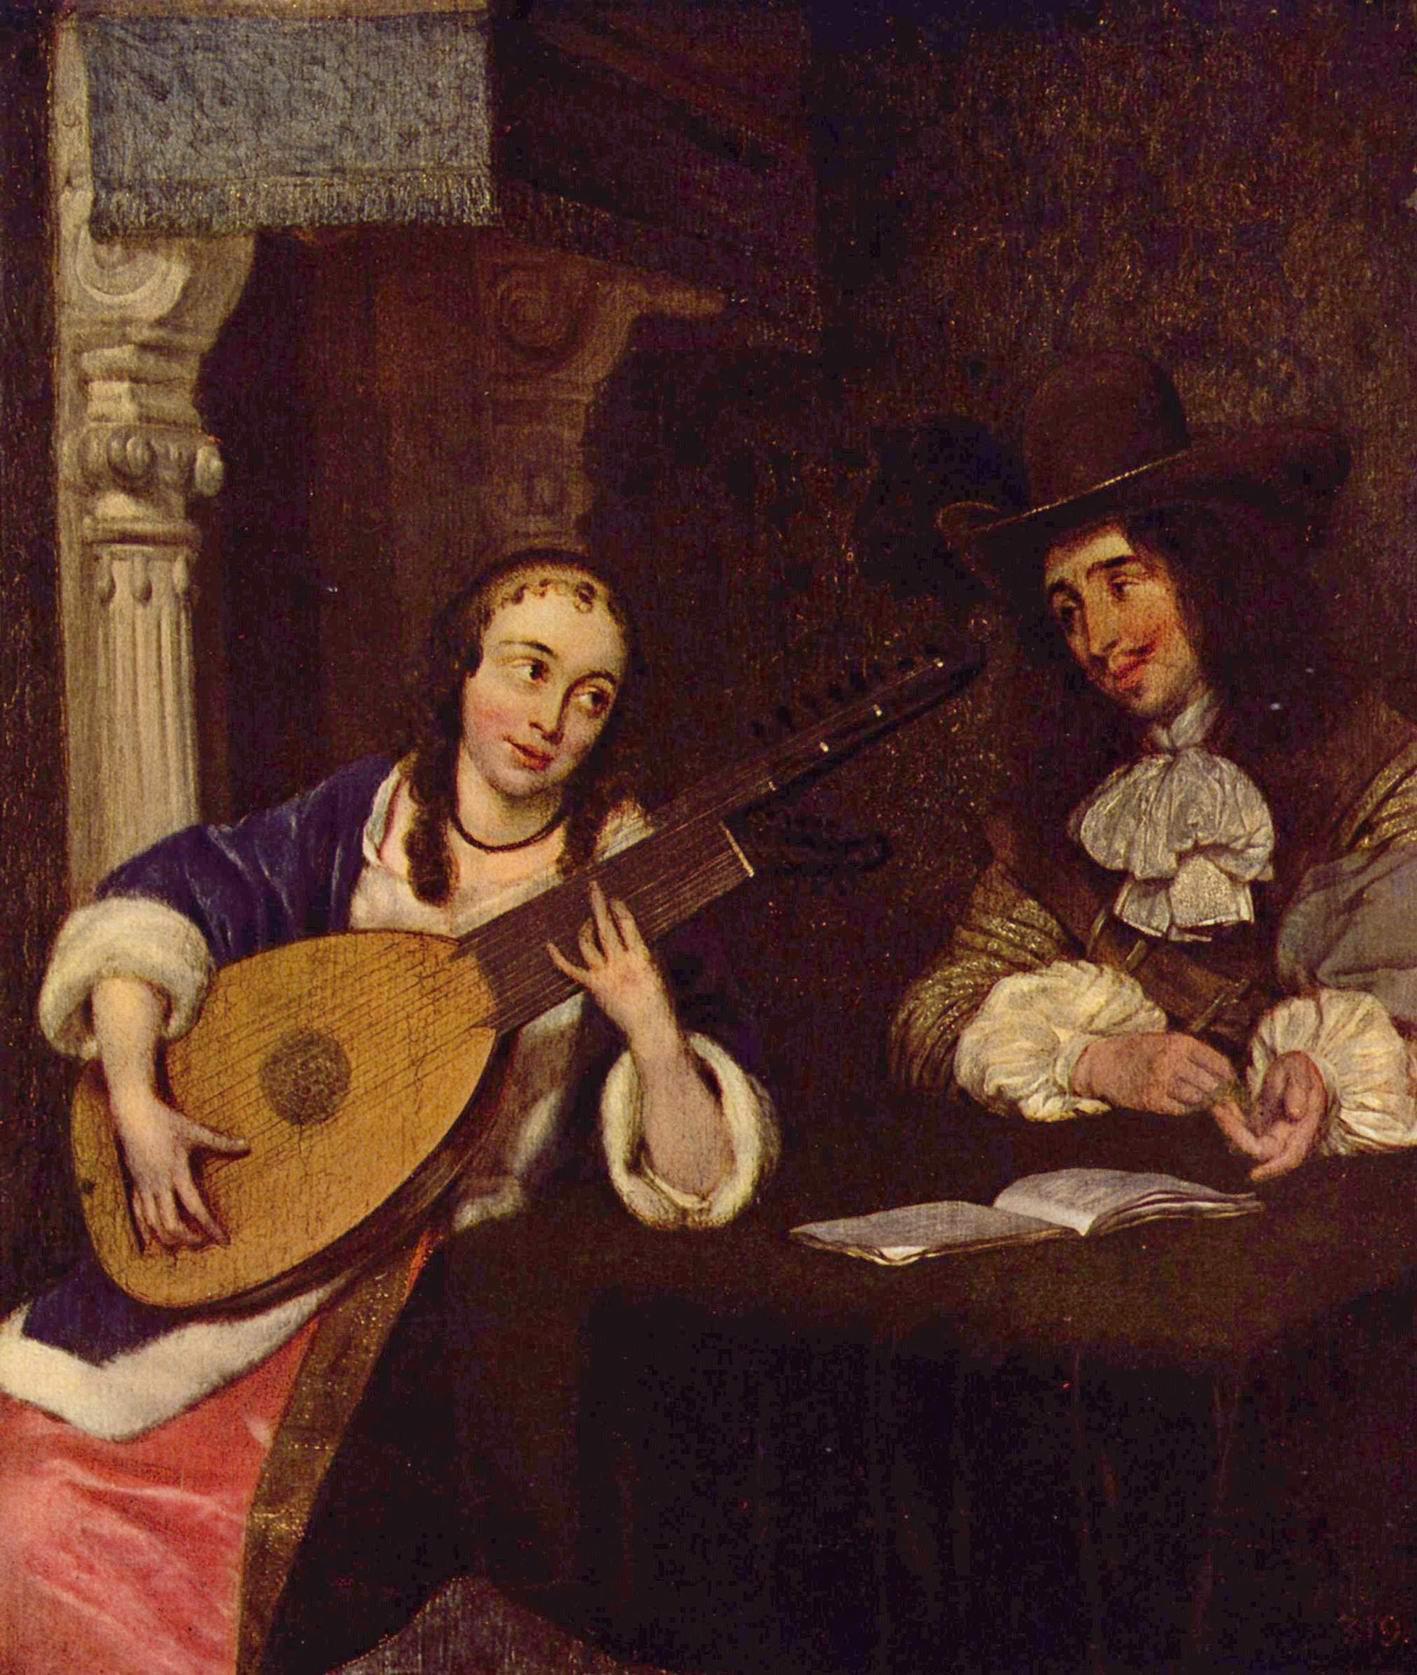 Девушка, играющая на лютне, Герард тер Борх Младший